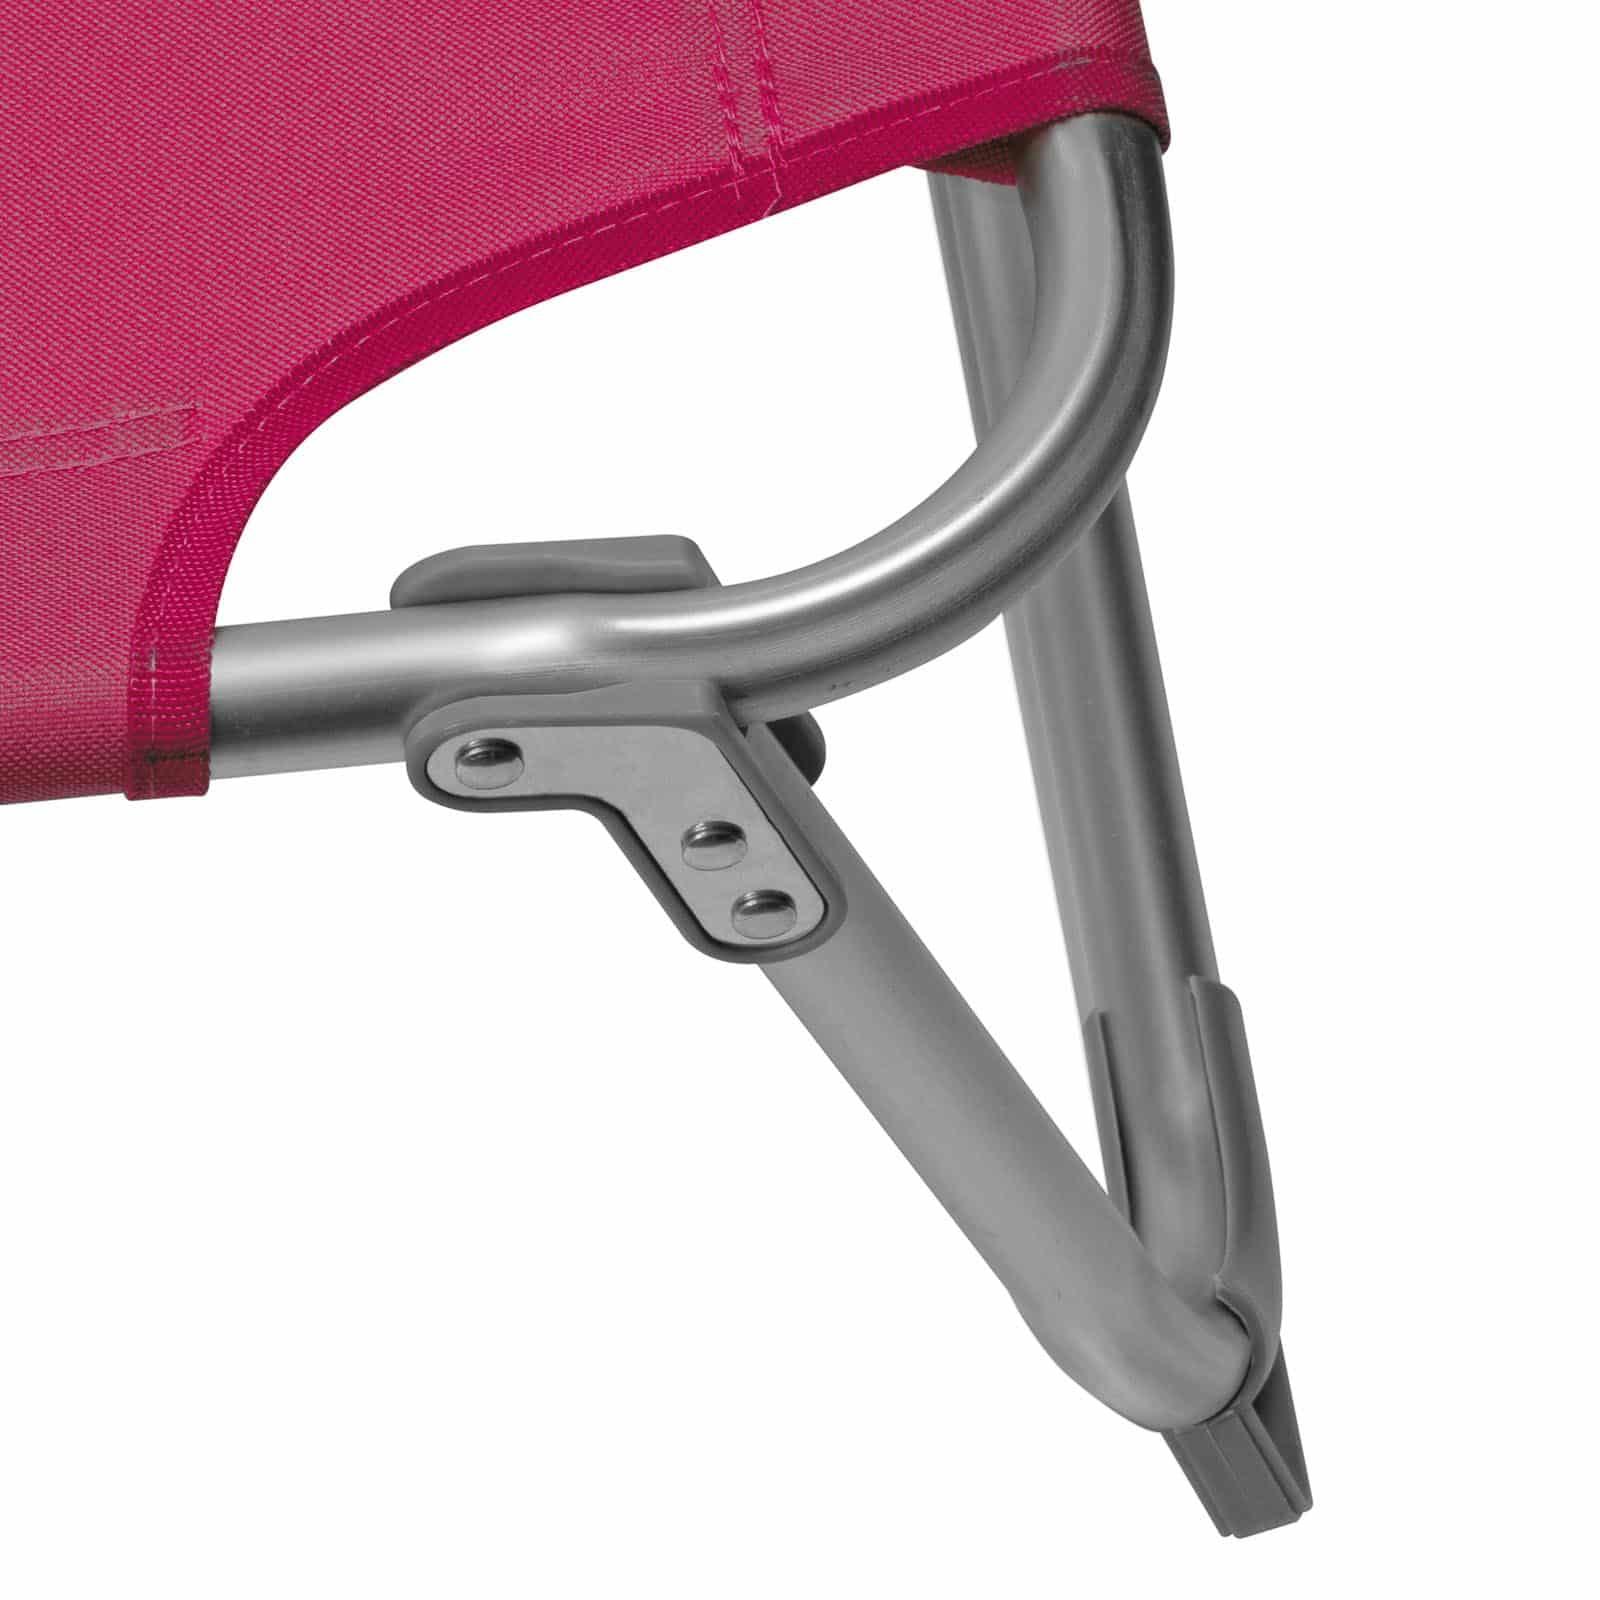 Comfortabel Aluminium Ligbed met Zonnendak 190x57 cm - Bordeauxrood